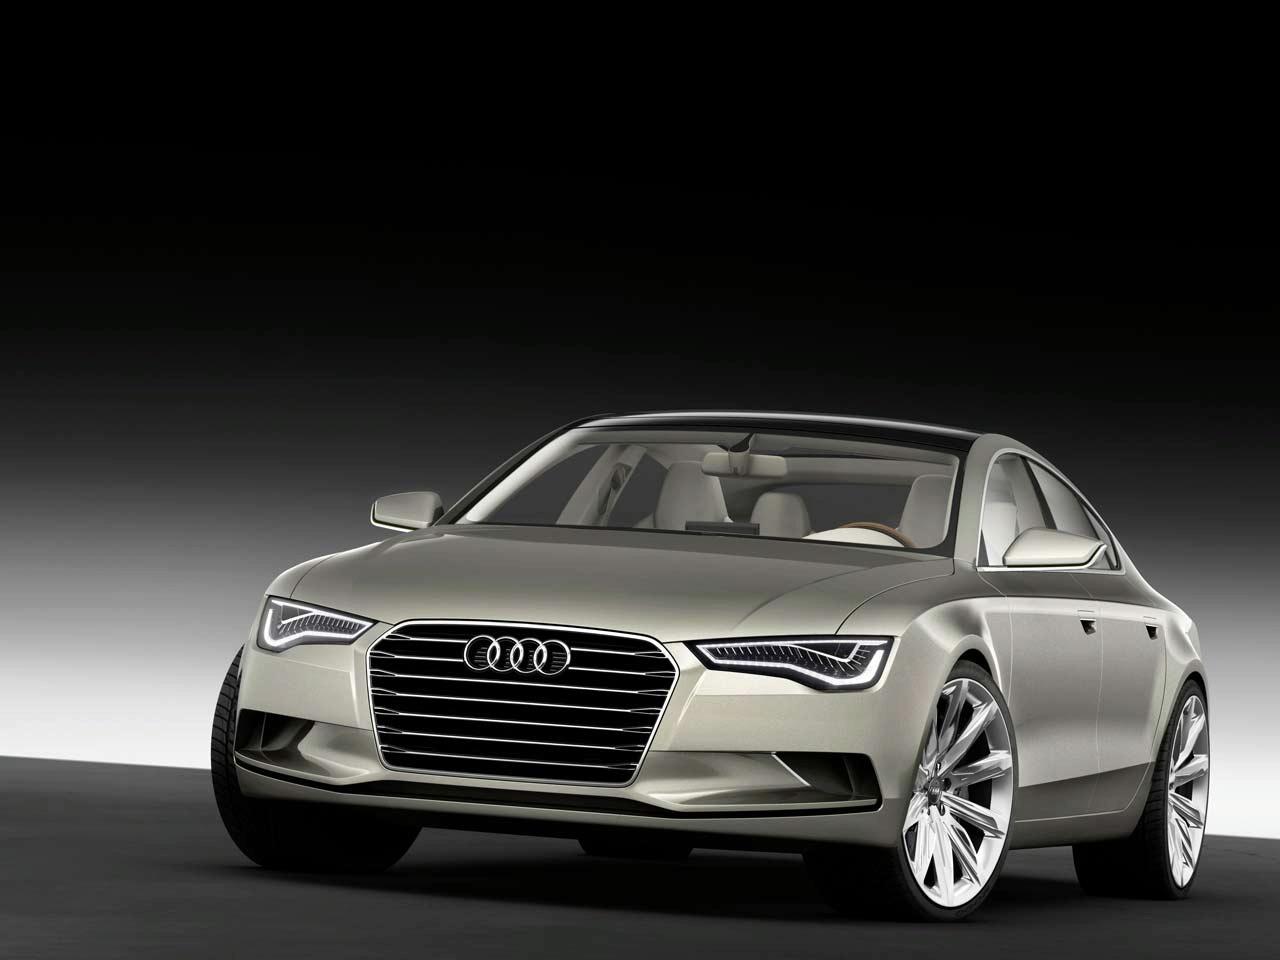 2013 Audi A7 Cars